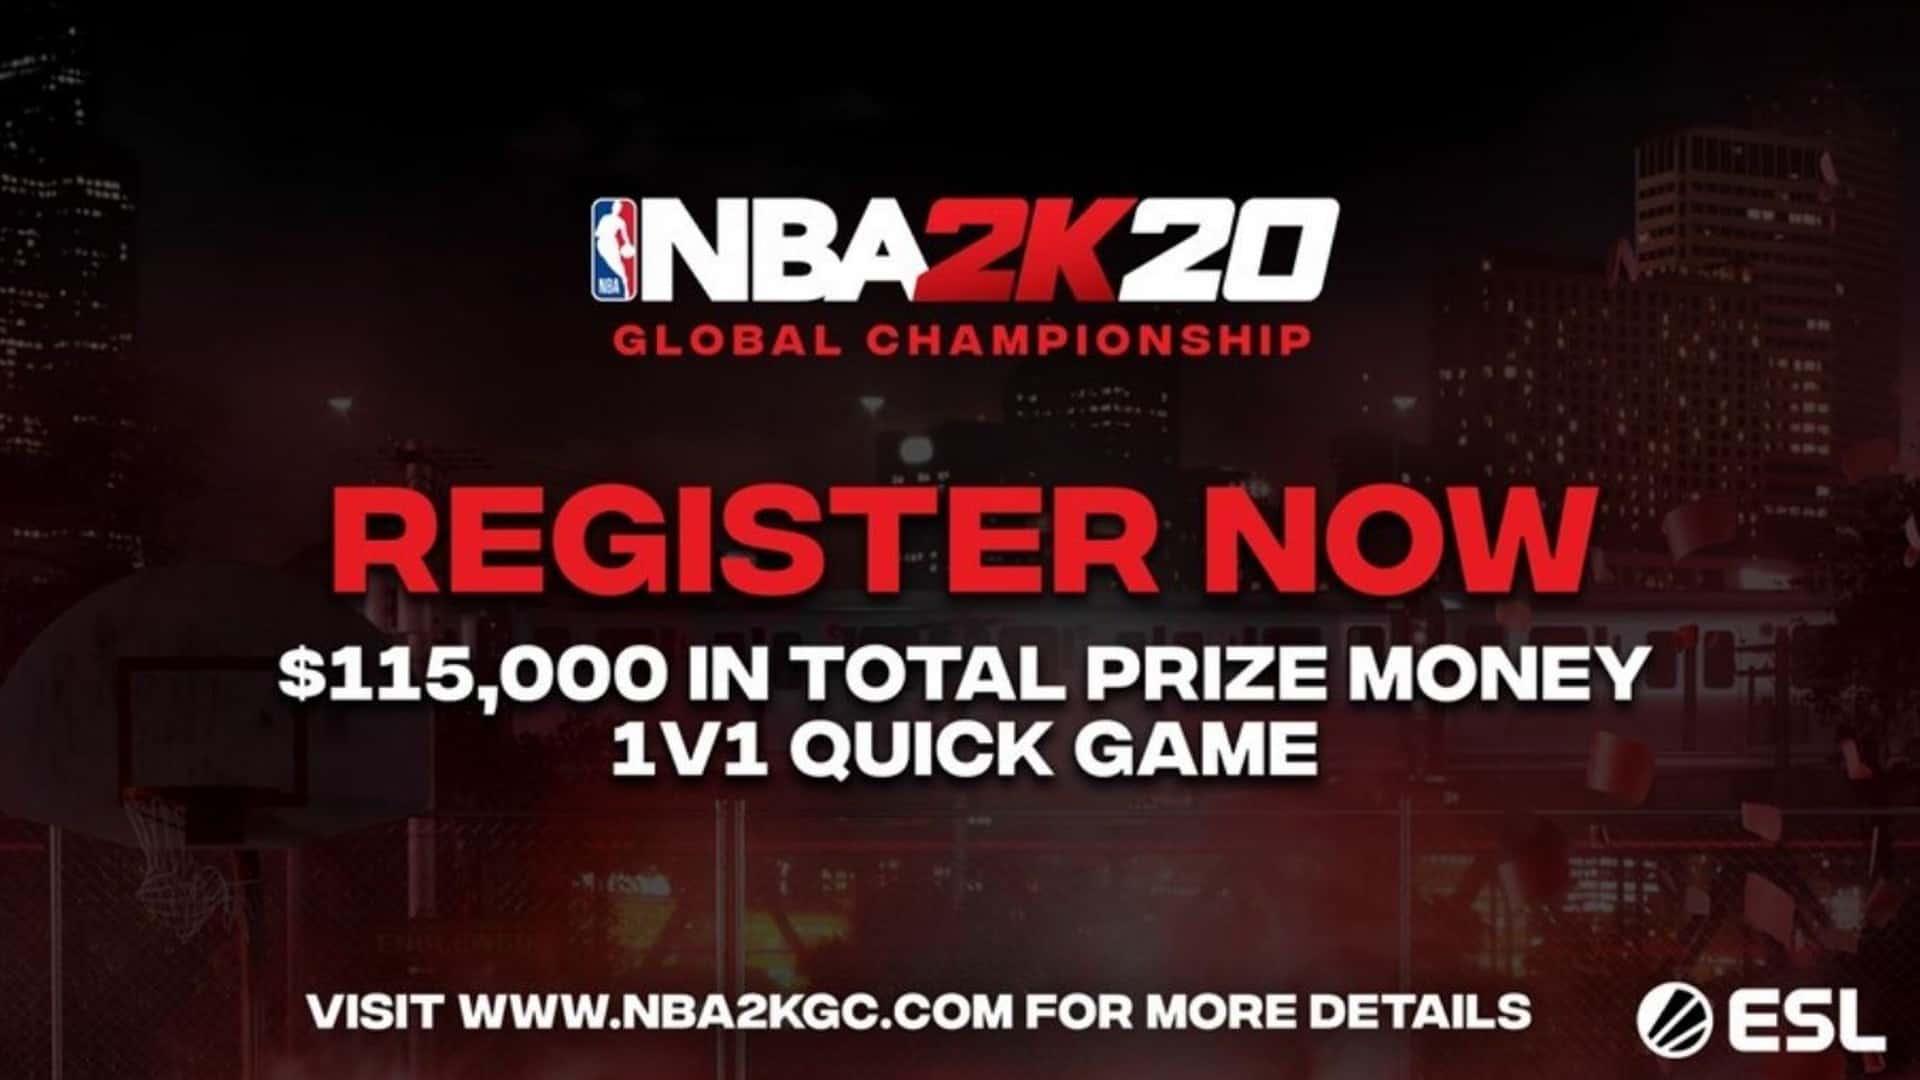 2K Announces Inaugural NBA 2K20 Global Championship